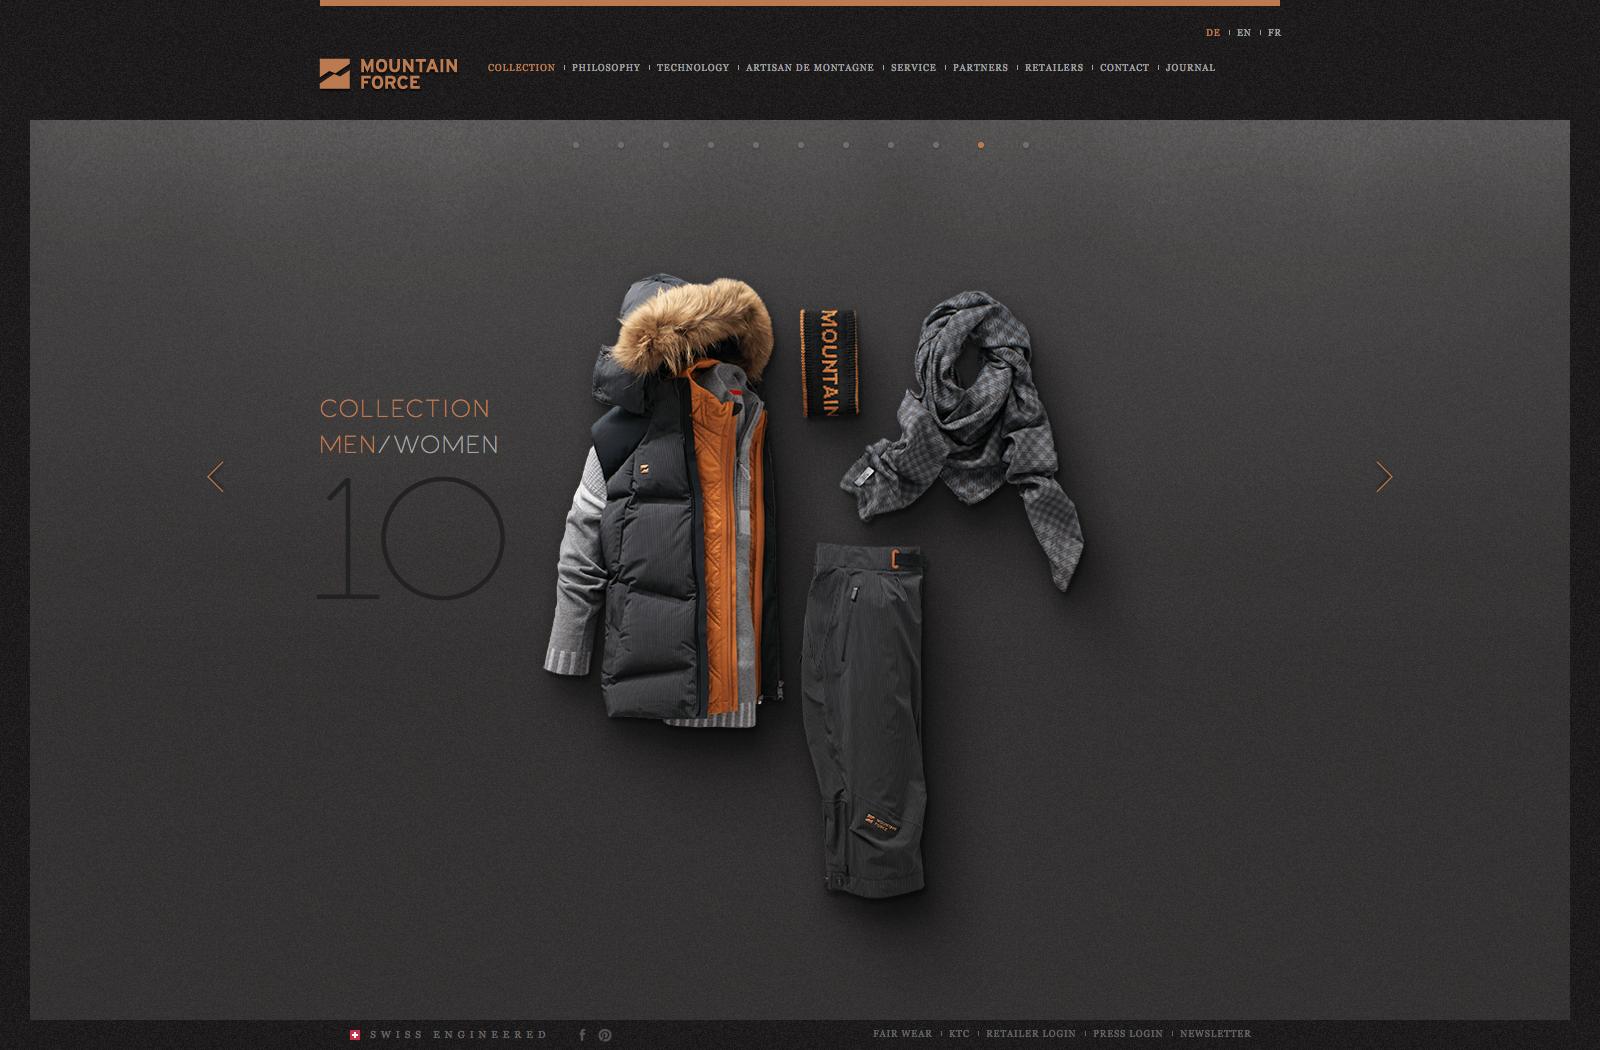 Mountain Force Webseite Kollektion